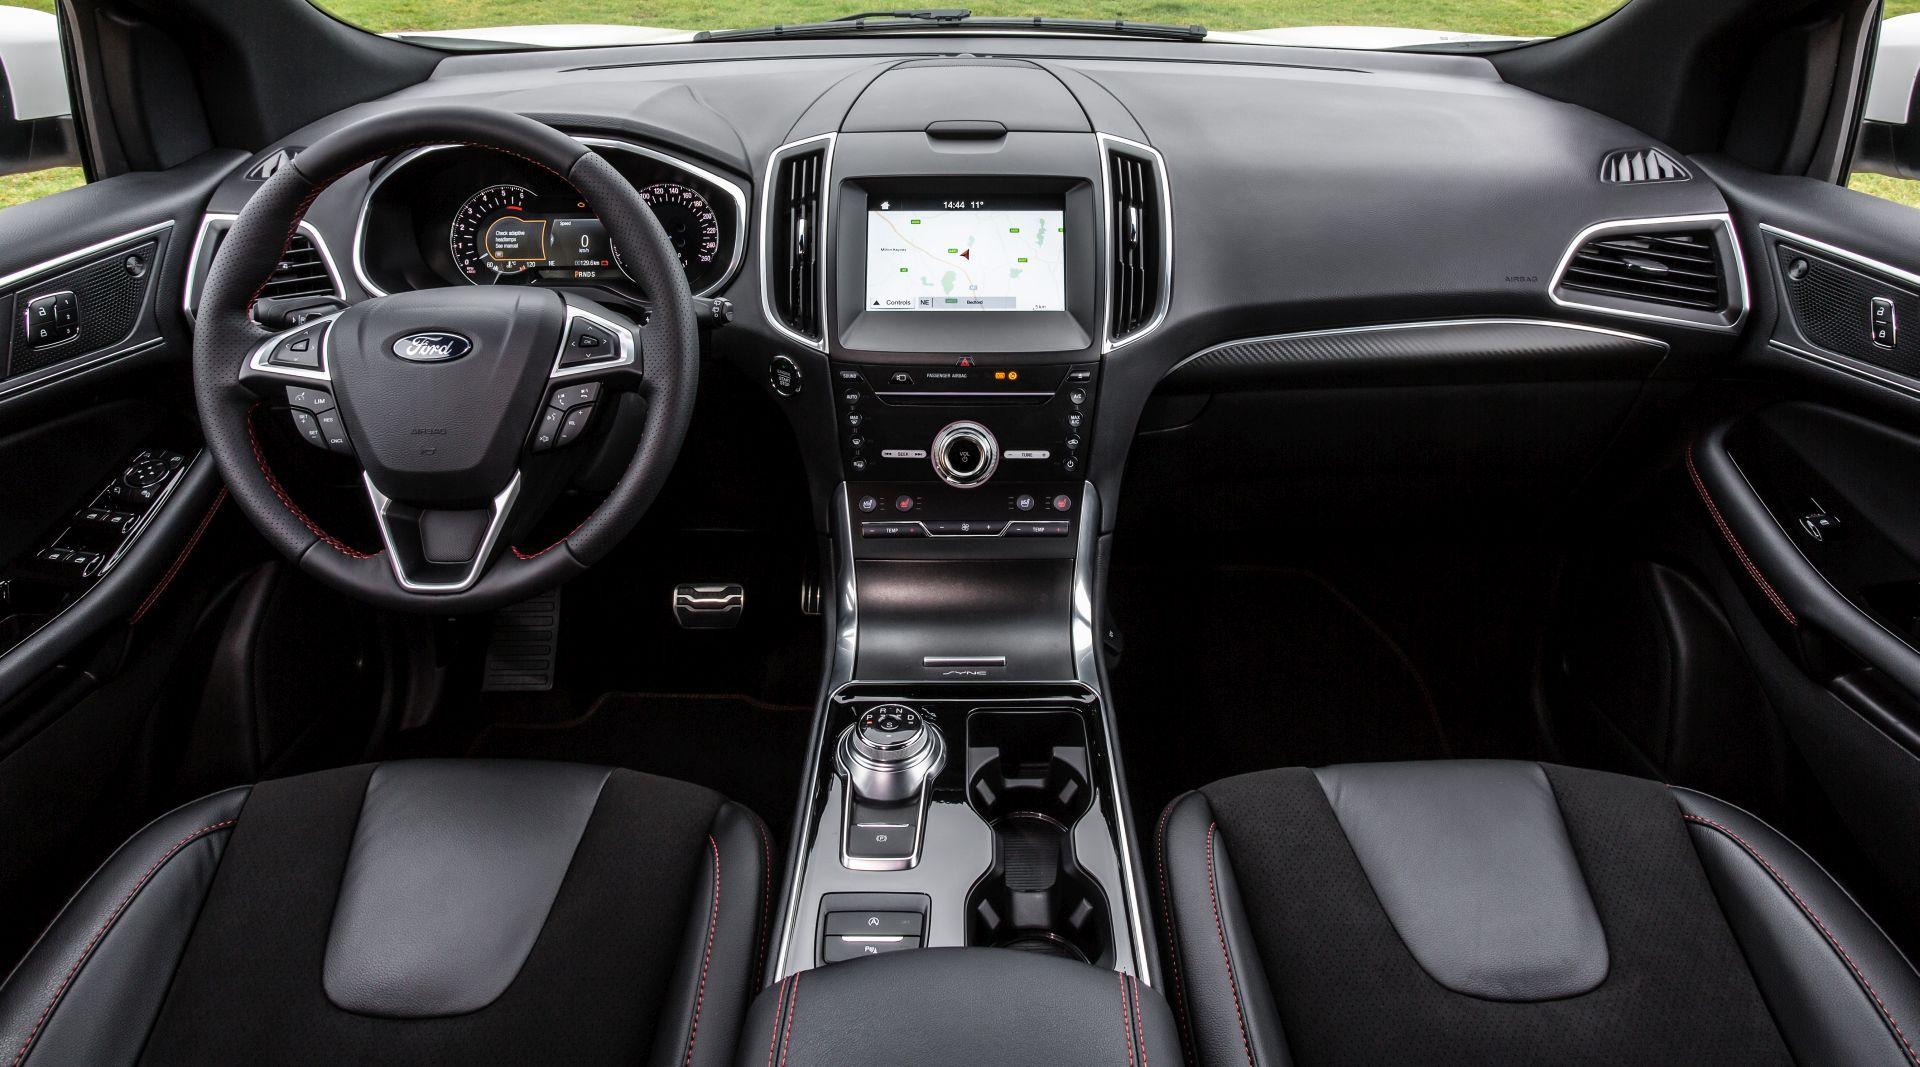 ford edge facelift ii auto autoevolution present europe